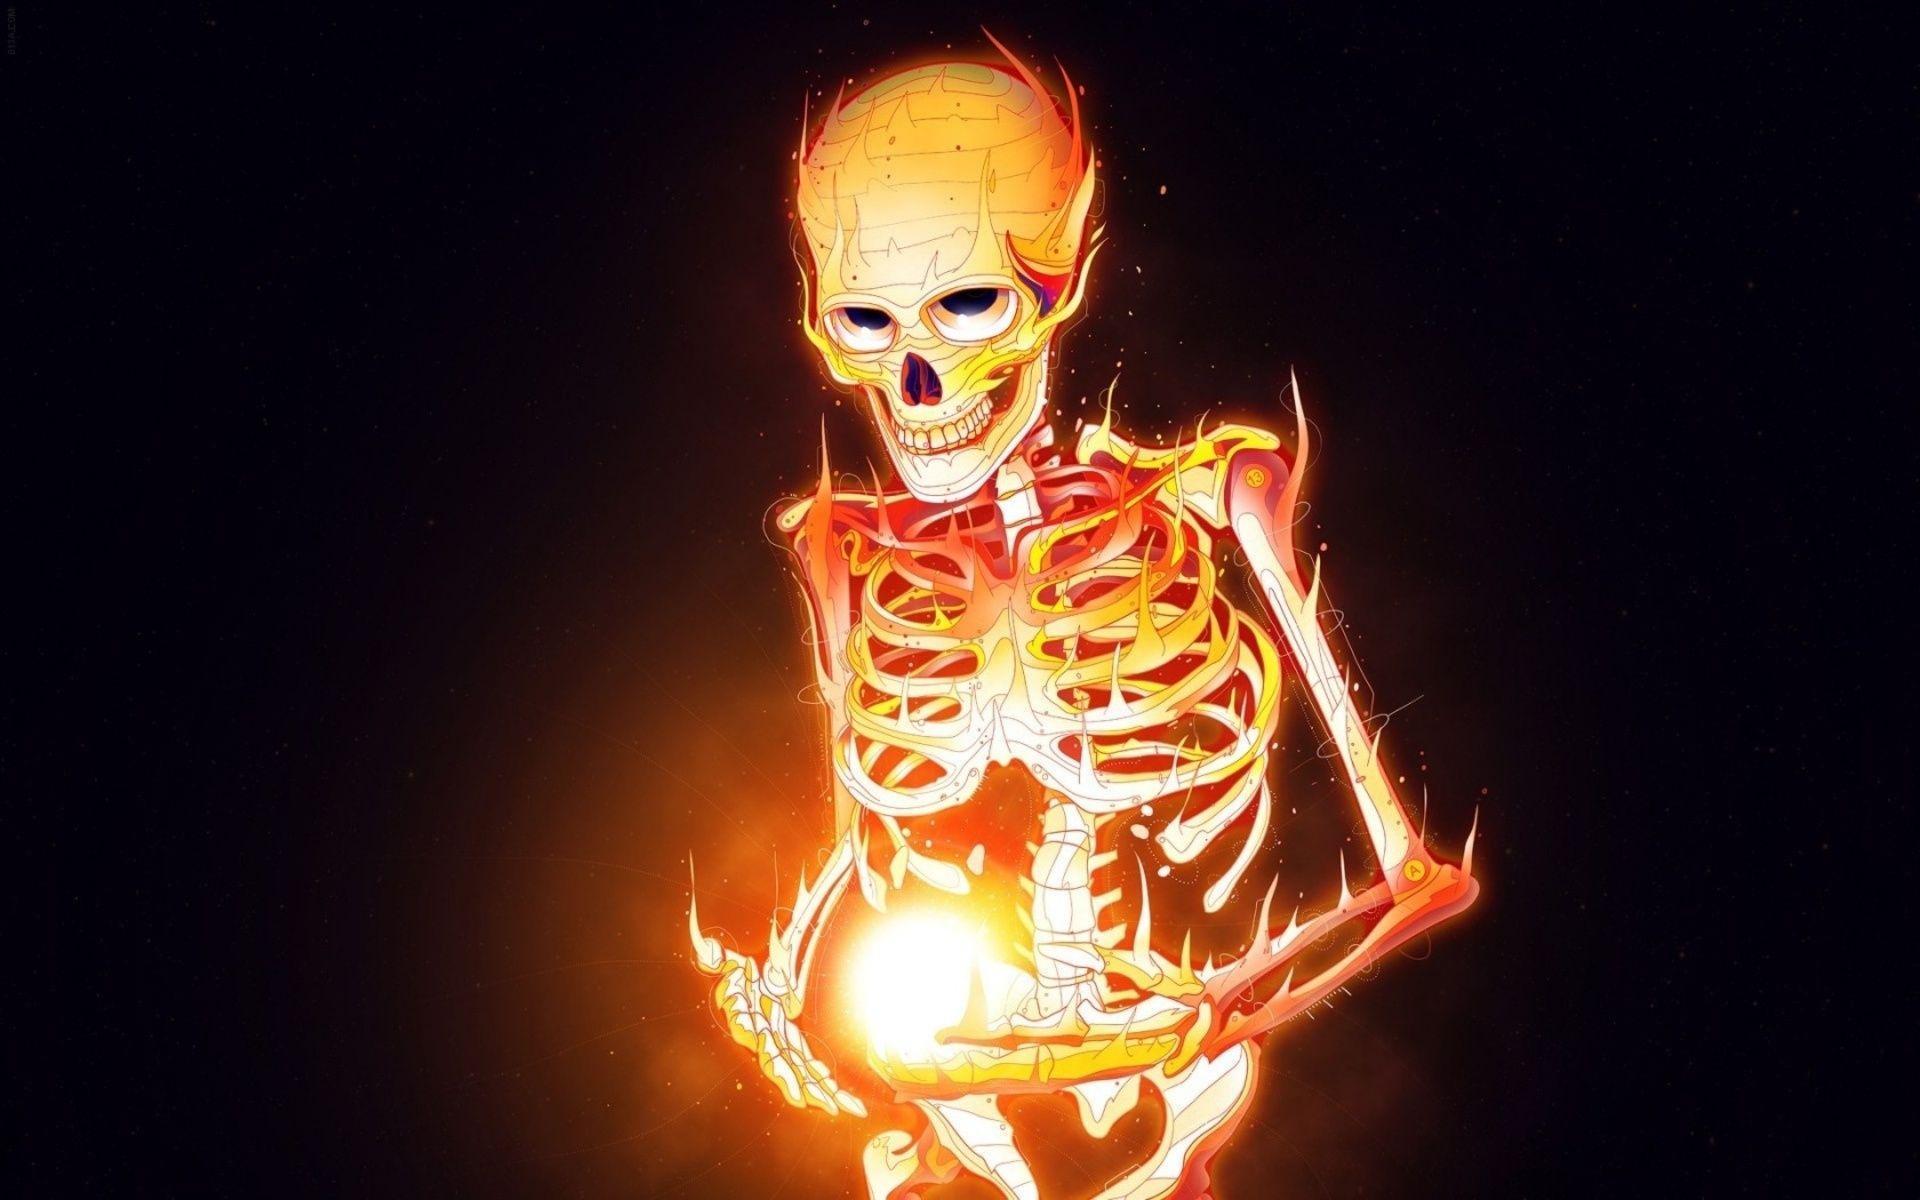 Amazing Wallpapers Burn Human Body - www.hdwallpapers88.com